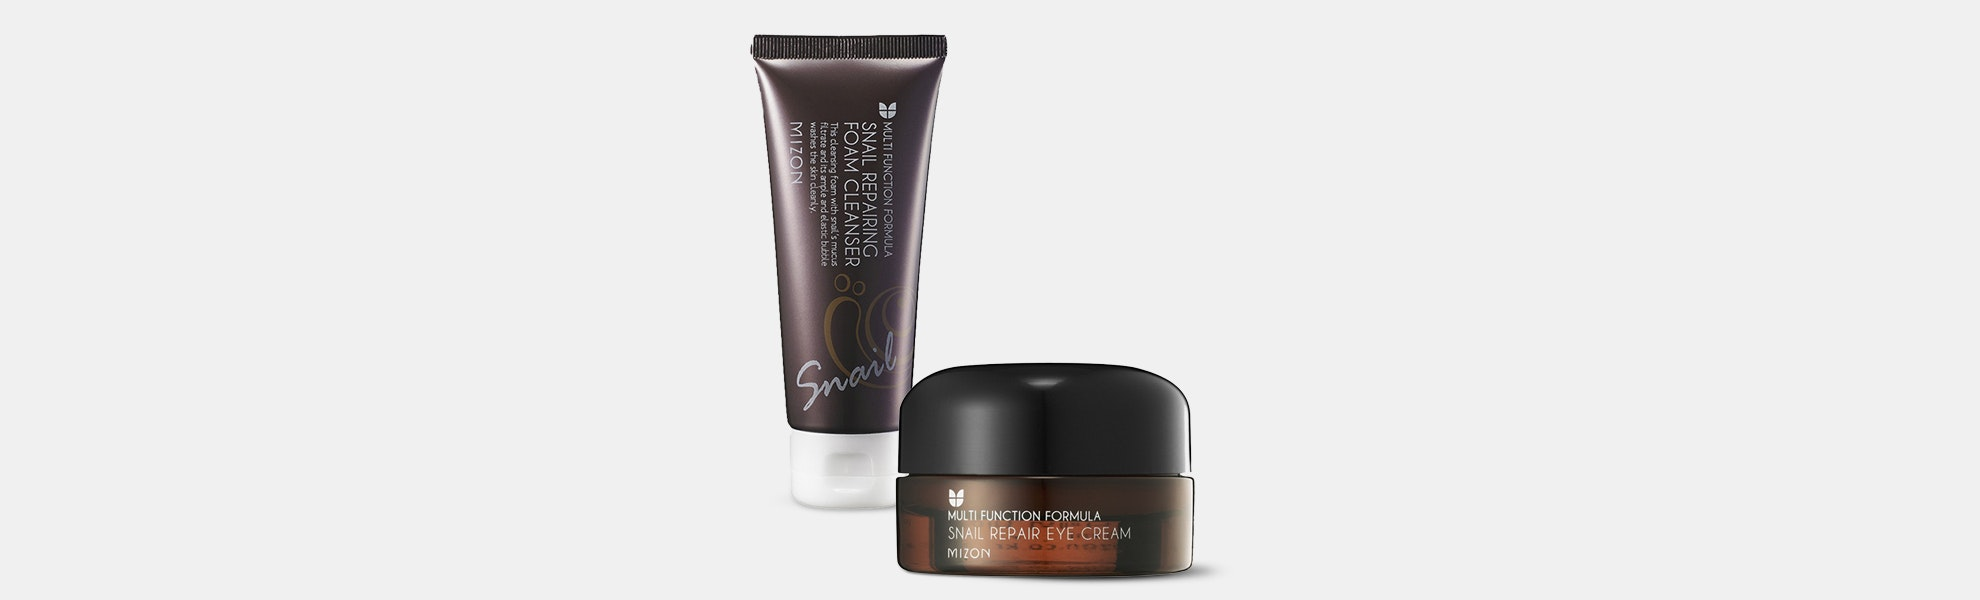 Mizon Snail Repair Eye Cream & Cleanser Set